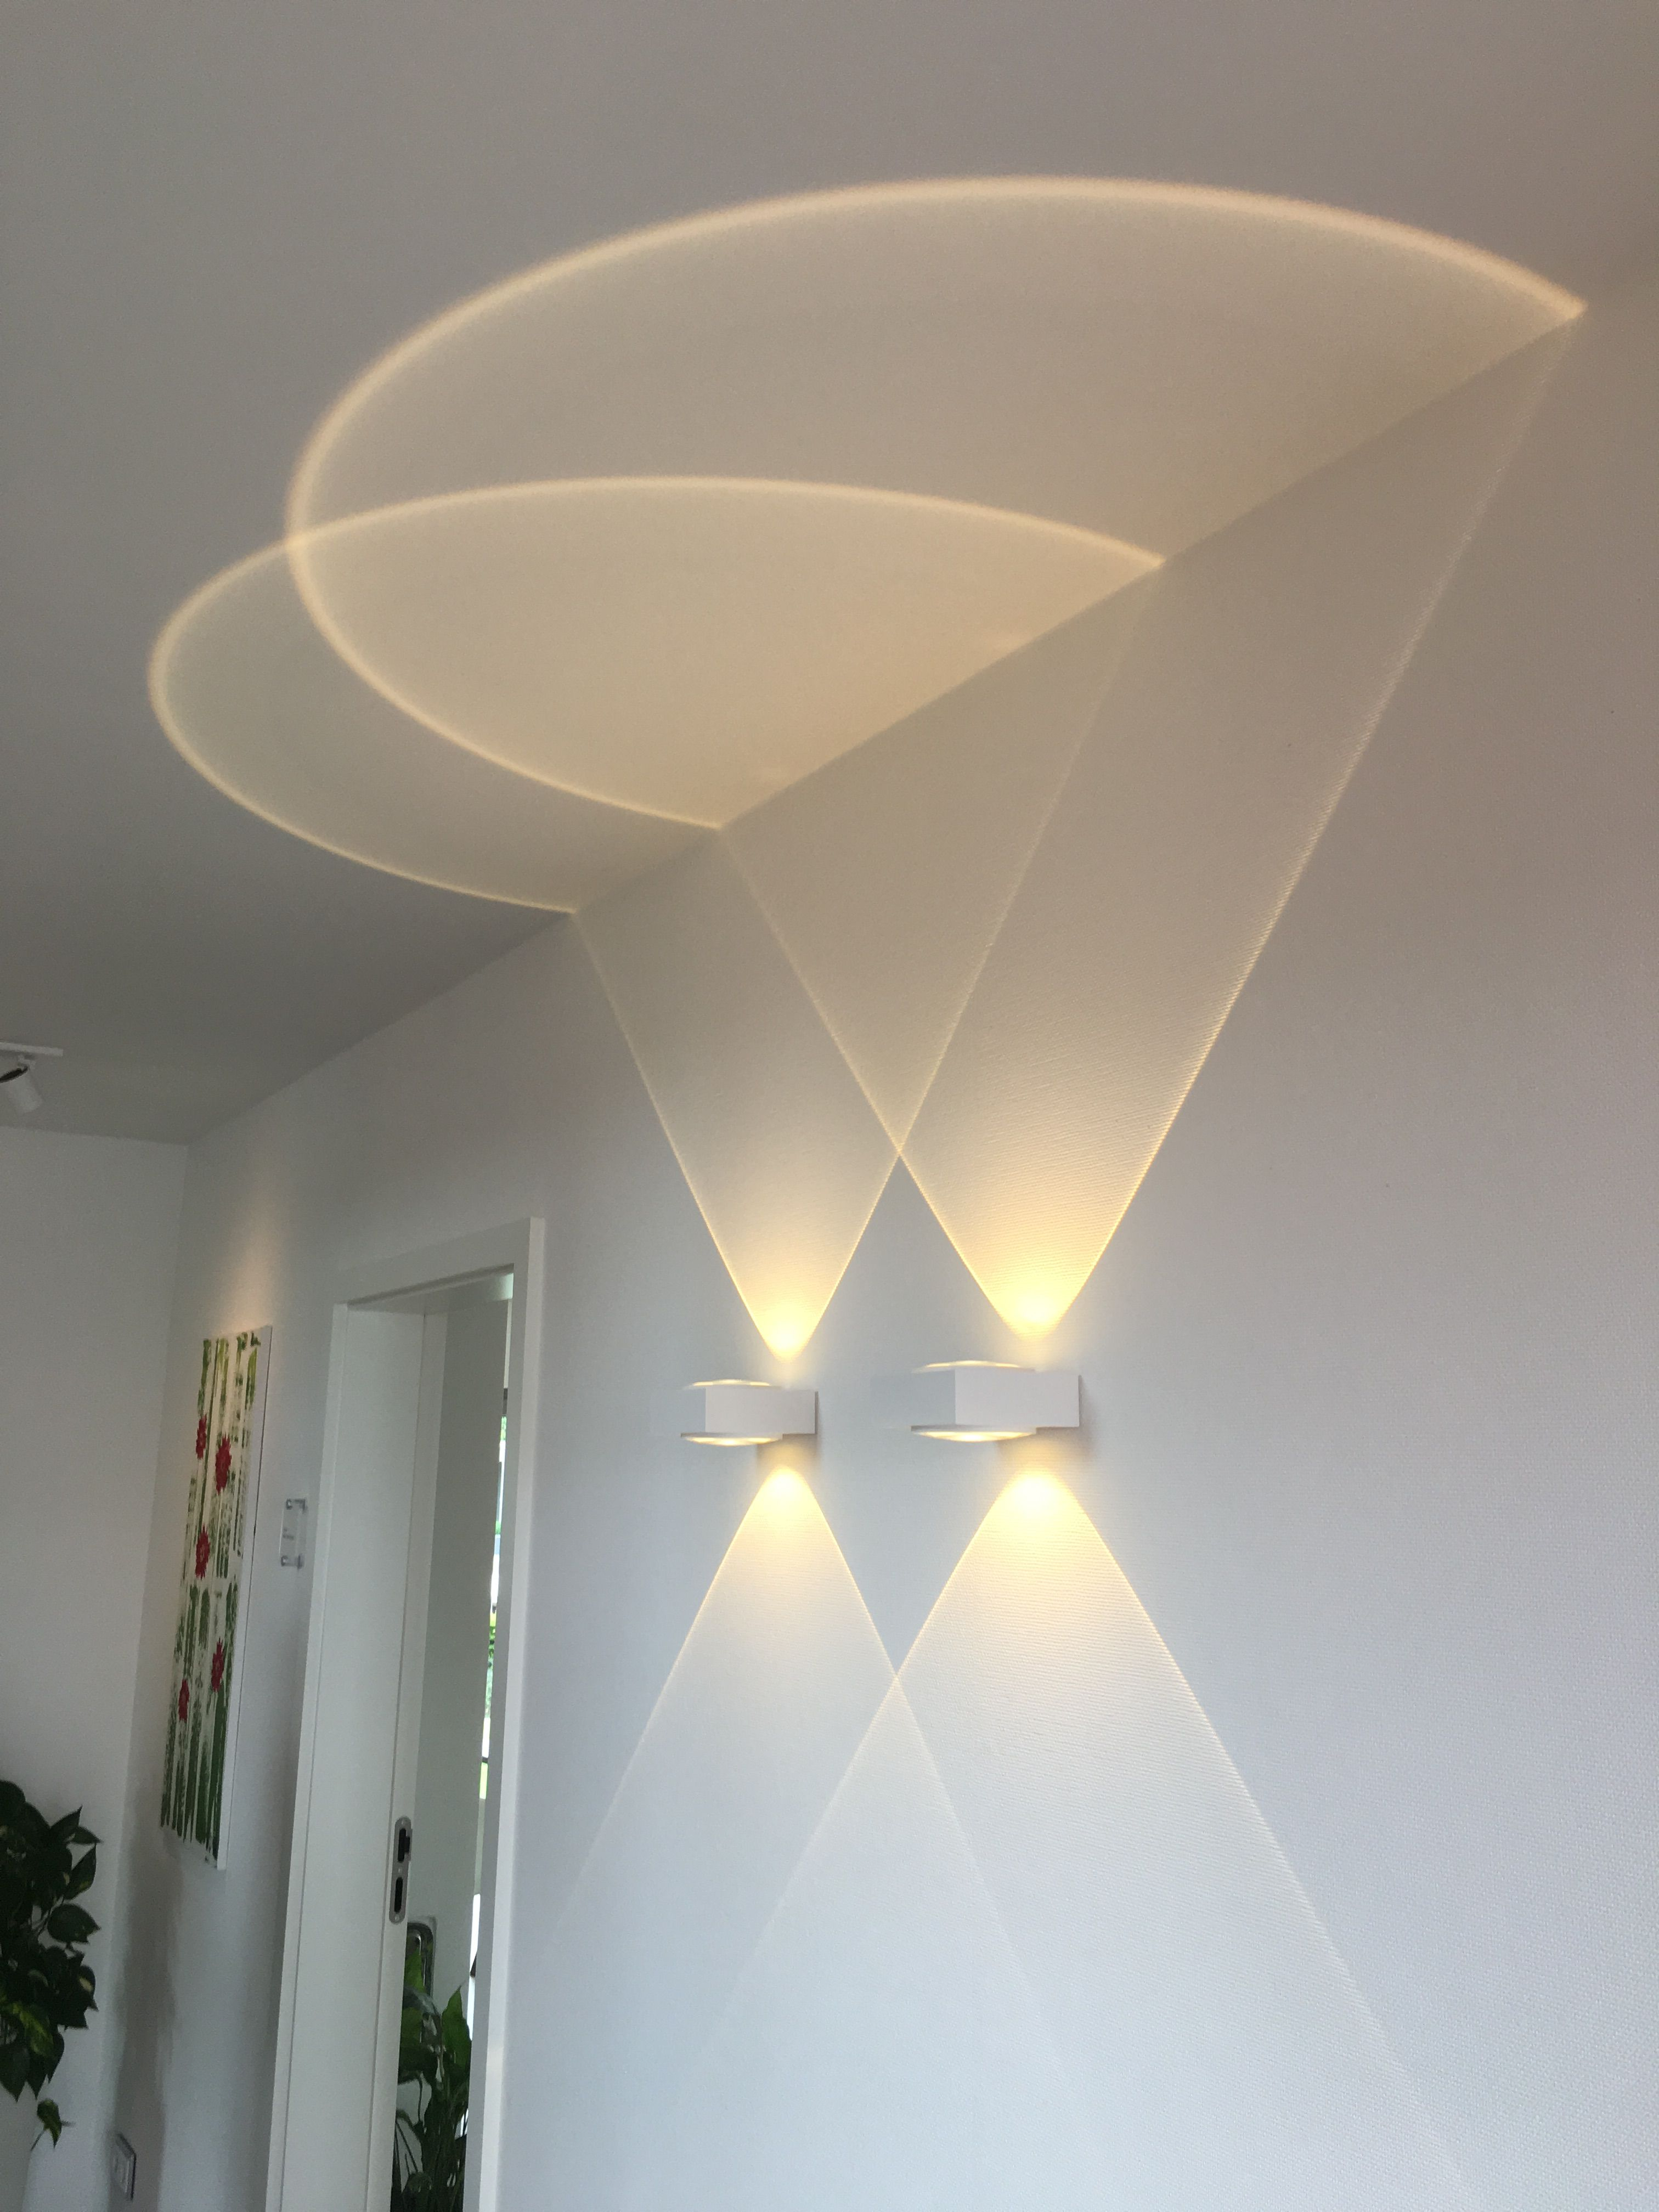 Pin By Brenda Irwin On Hauschen Ceiling Light Design Wall Lighting Design Lighting Design Interior